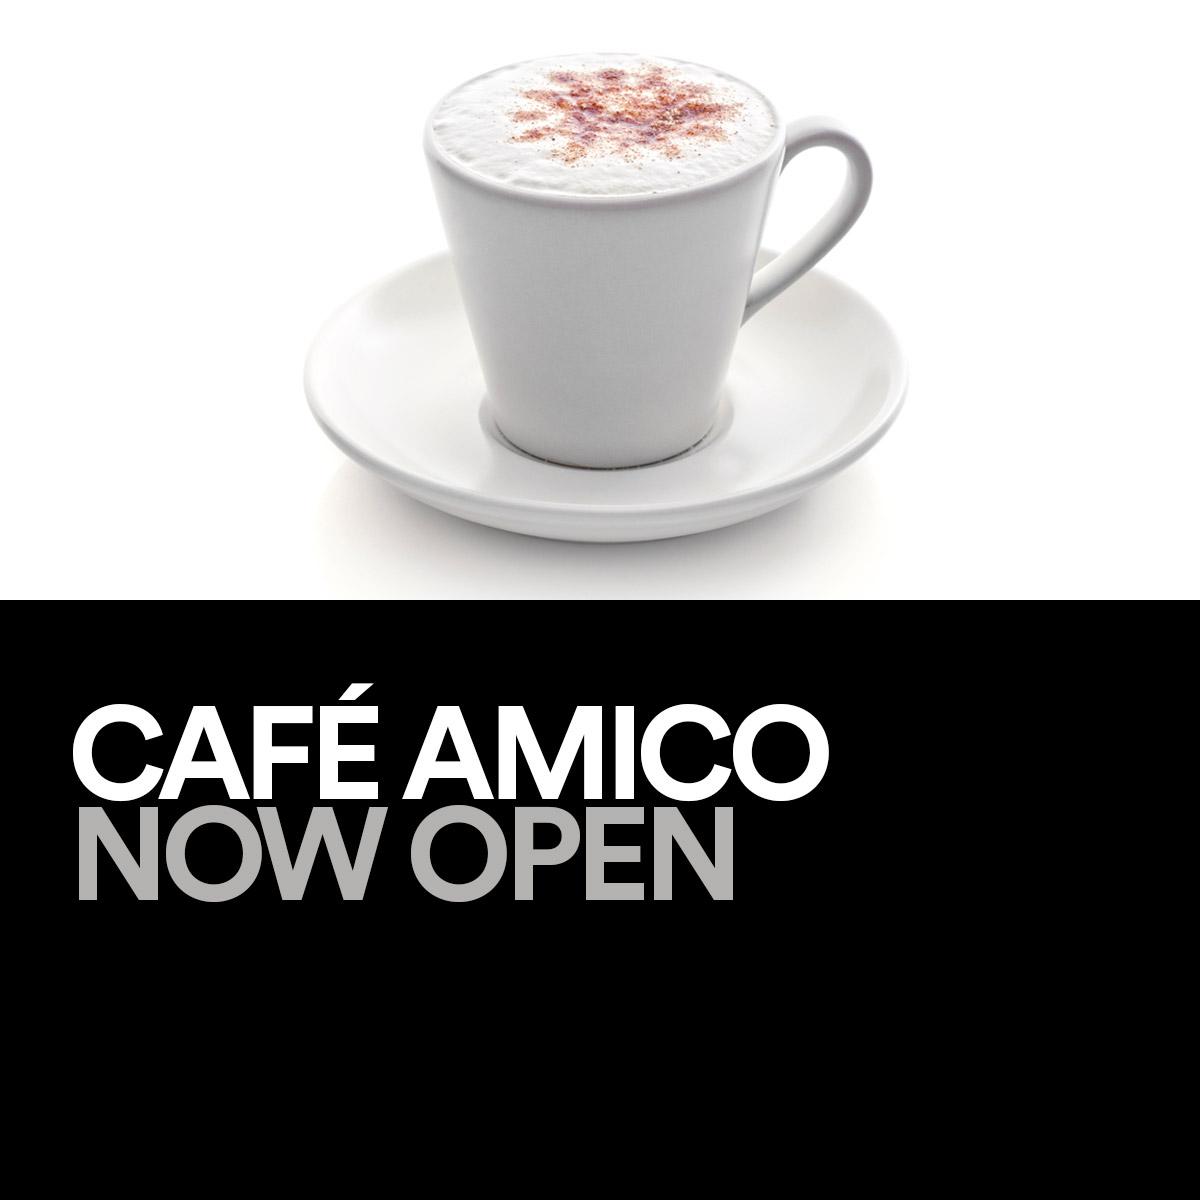 Sugarloaf Mills - Promo - Cafe Amico image